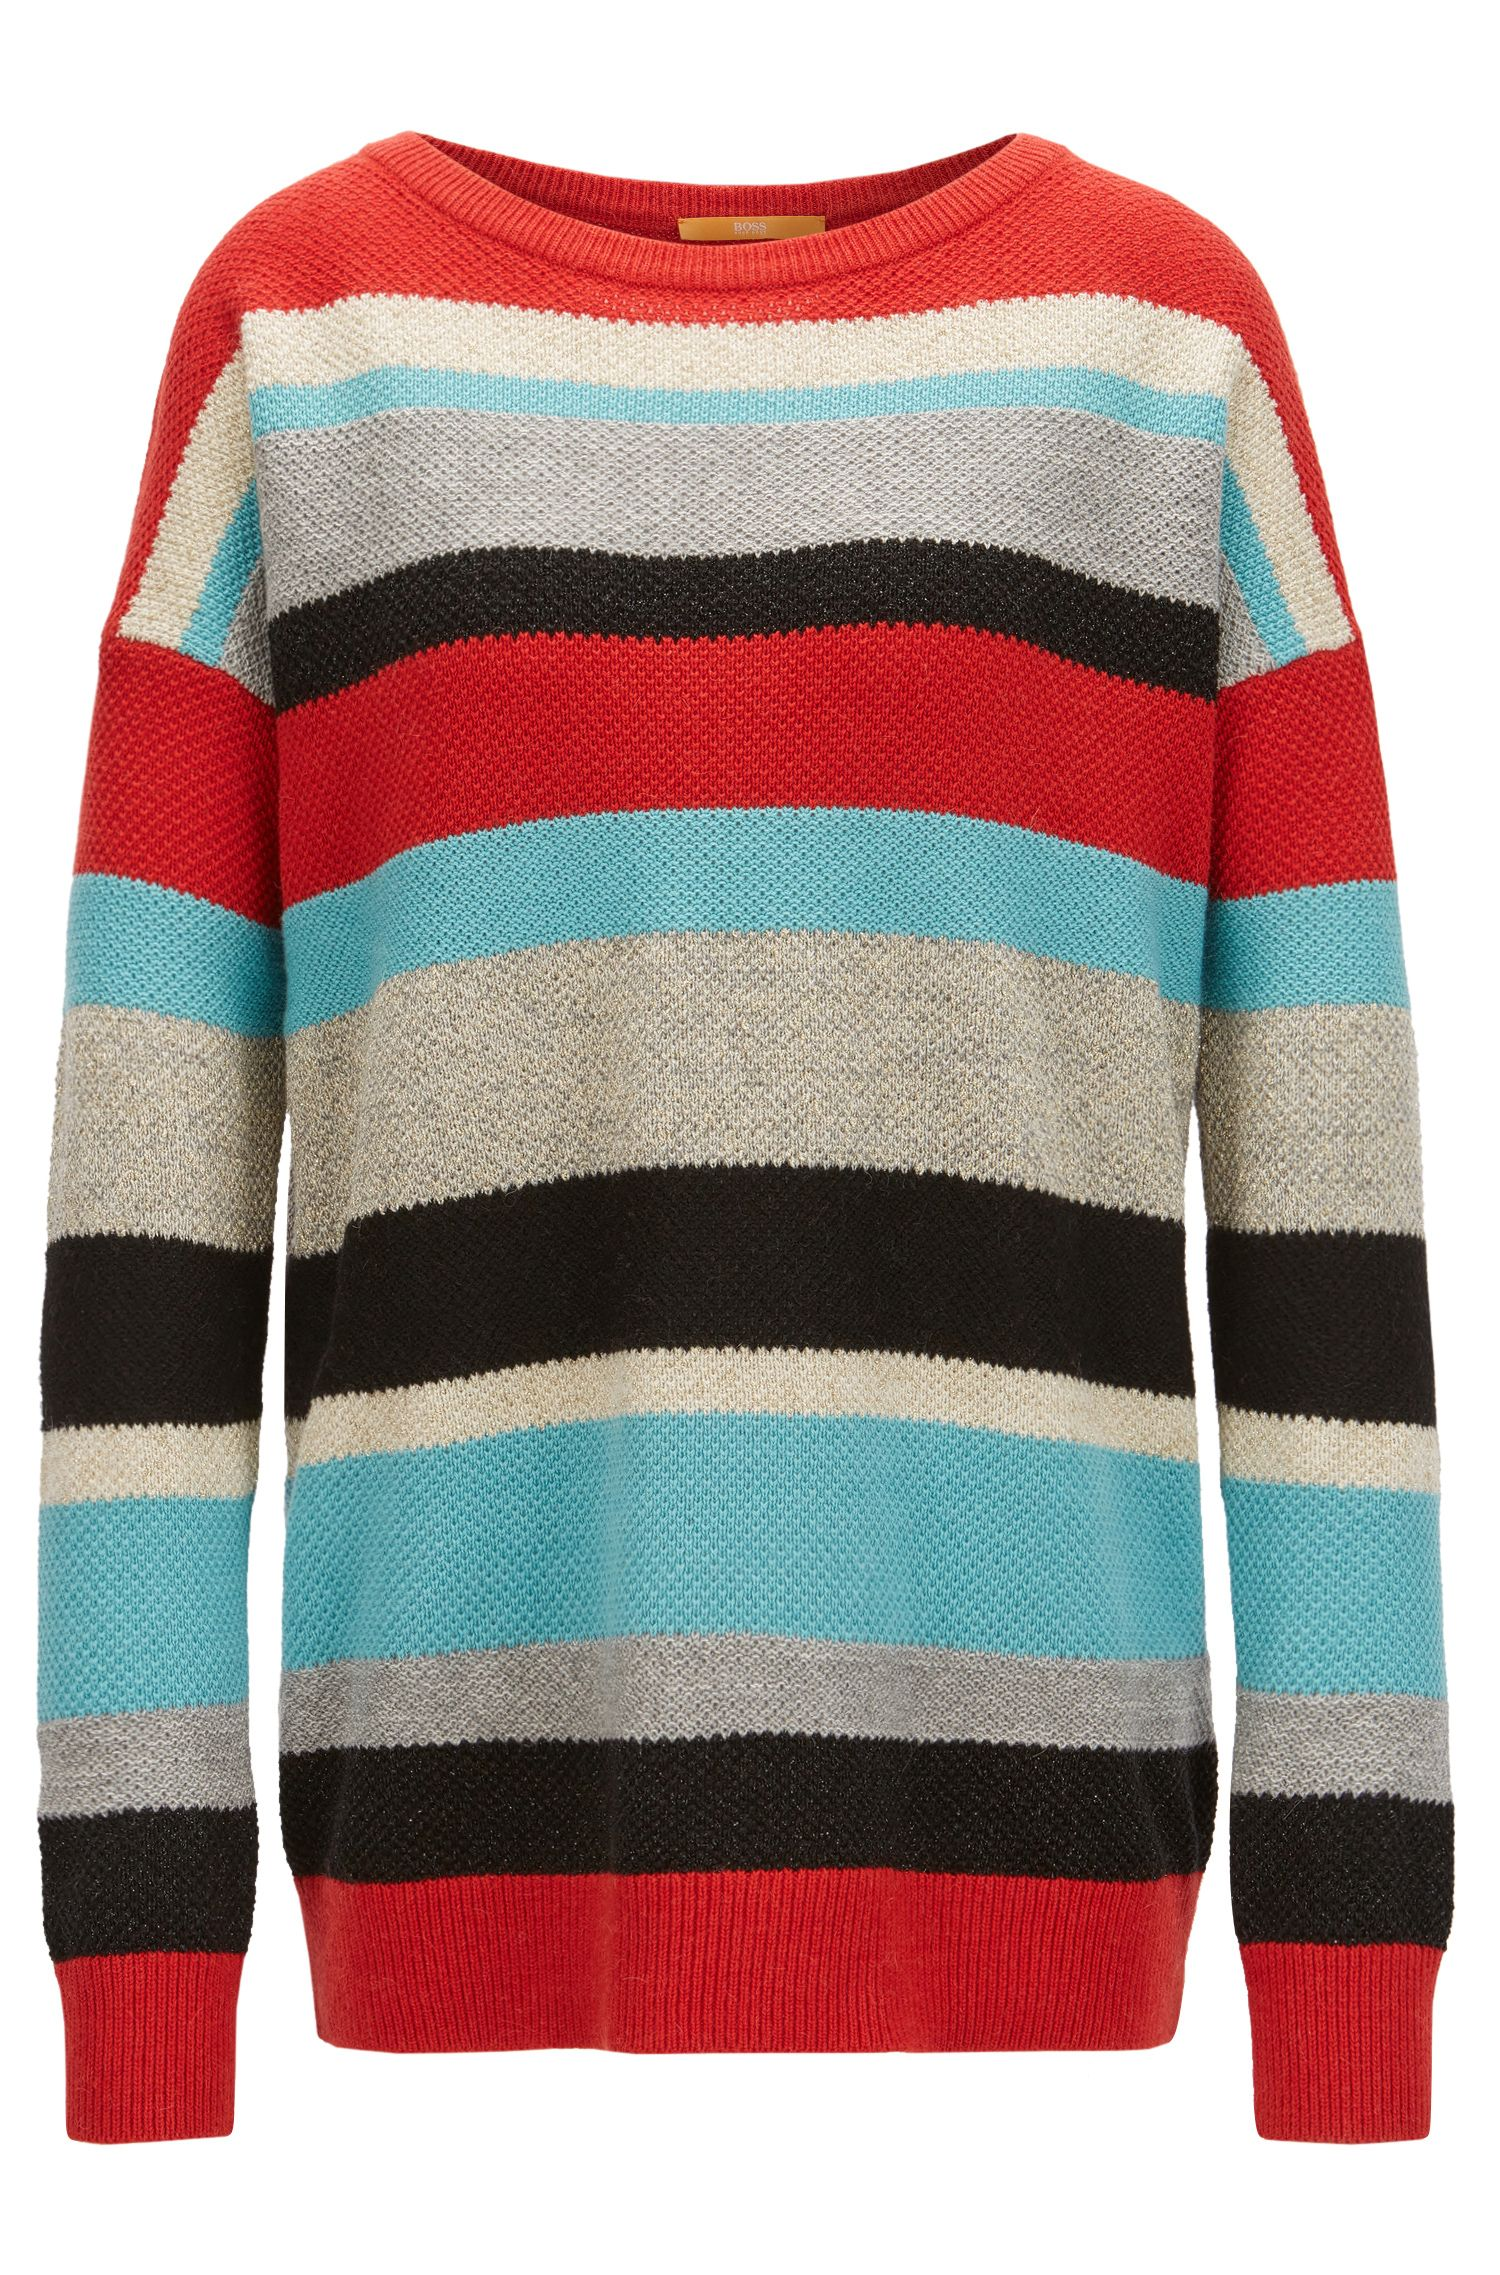 Jersey a rayas de varios colores en punto con textura